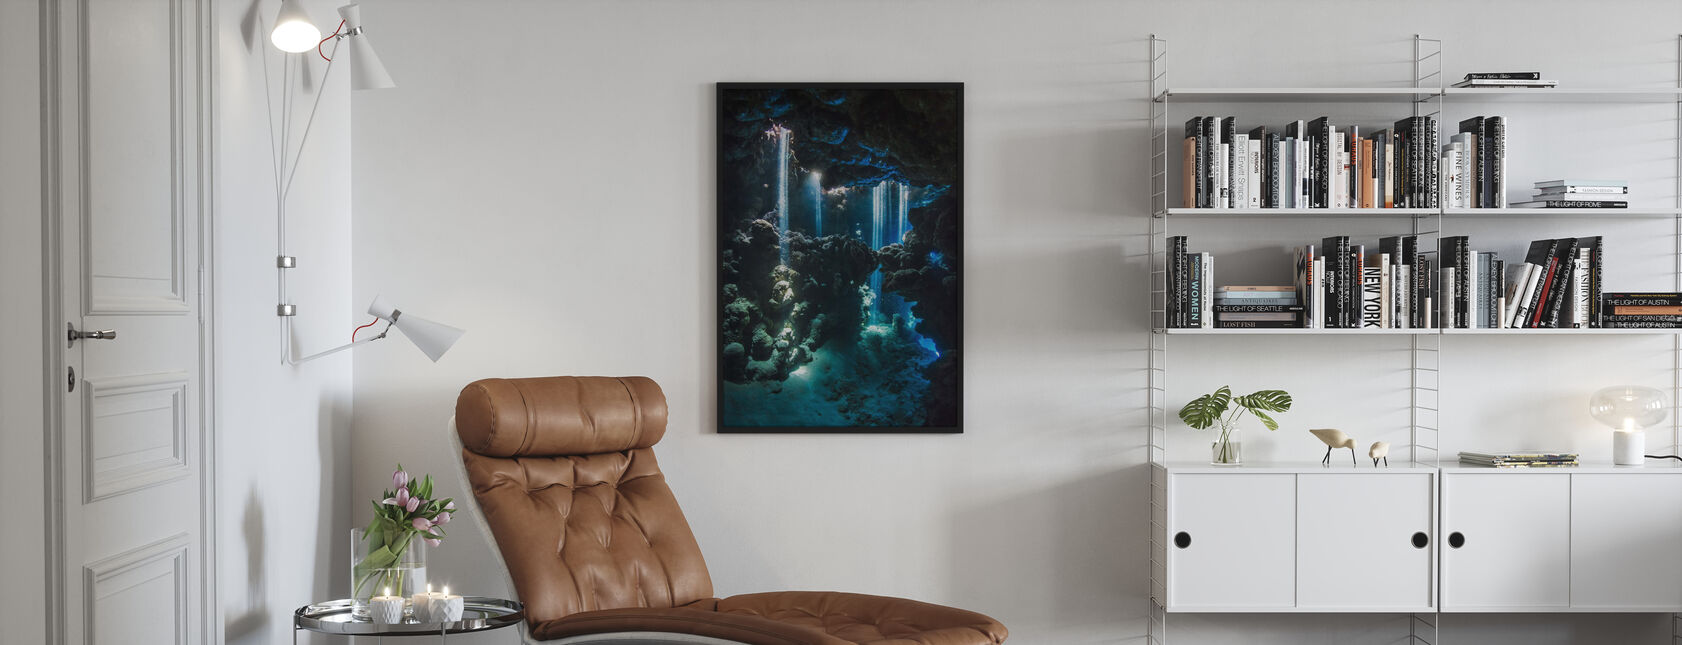 Lysets aksler - Plakat - Stue